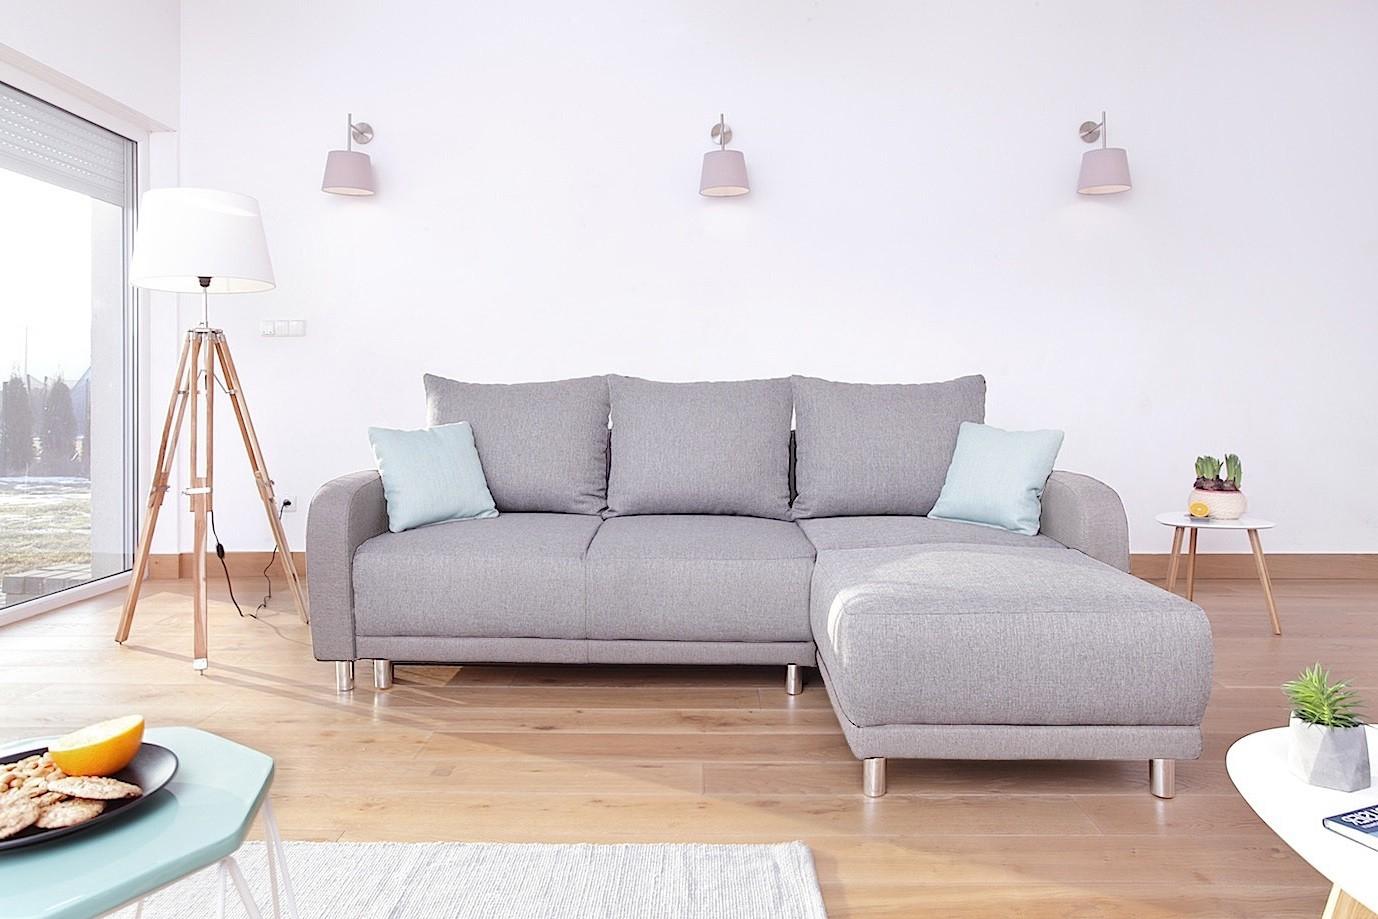 Canapé d angle convertible scandinave gris clair Minty